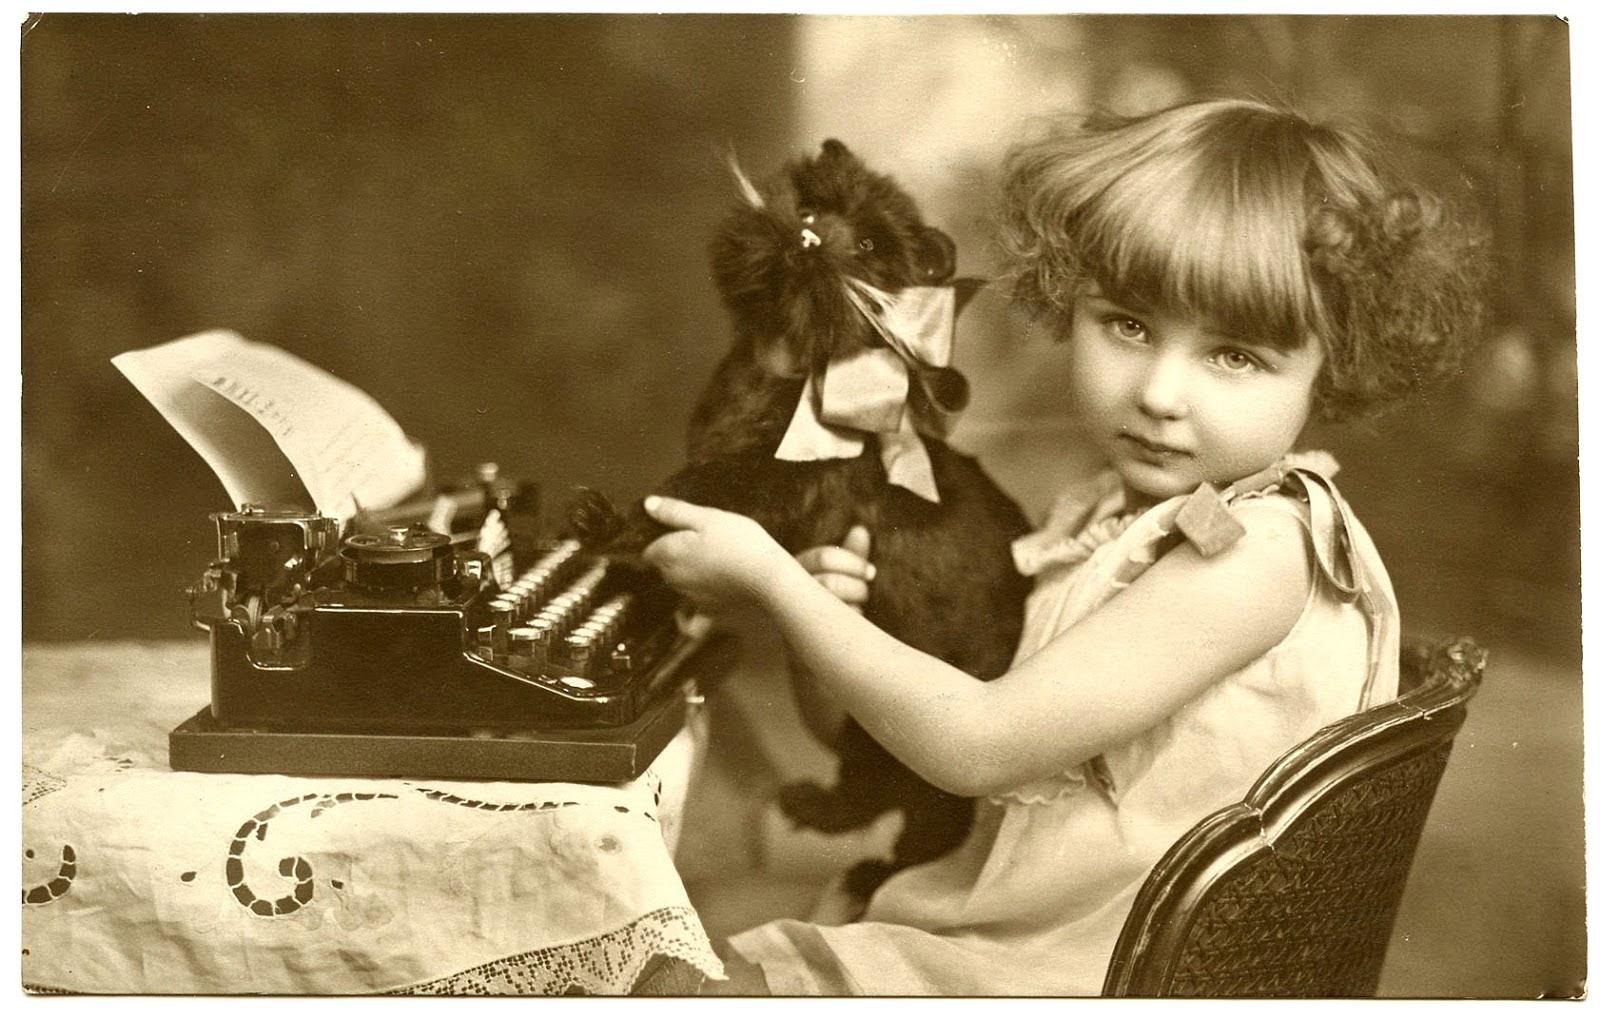 Bildergebnis für Betty MacDonald and cats